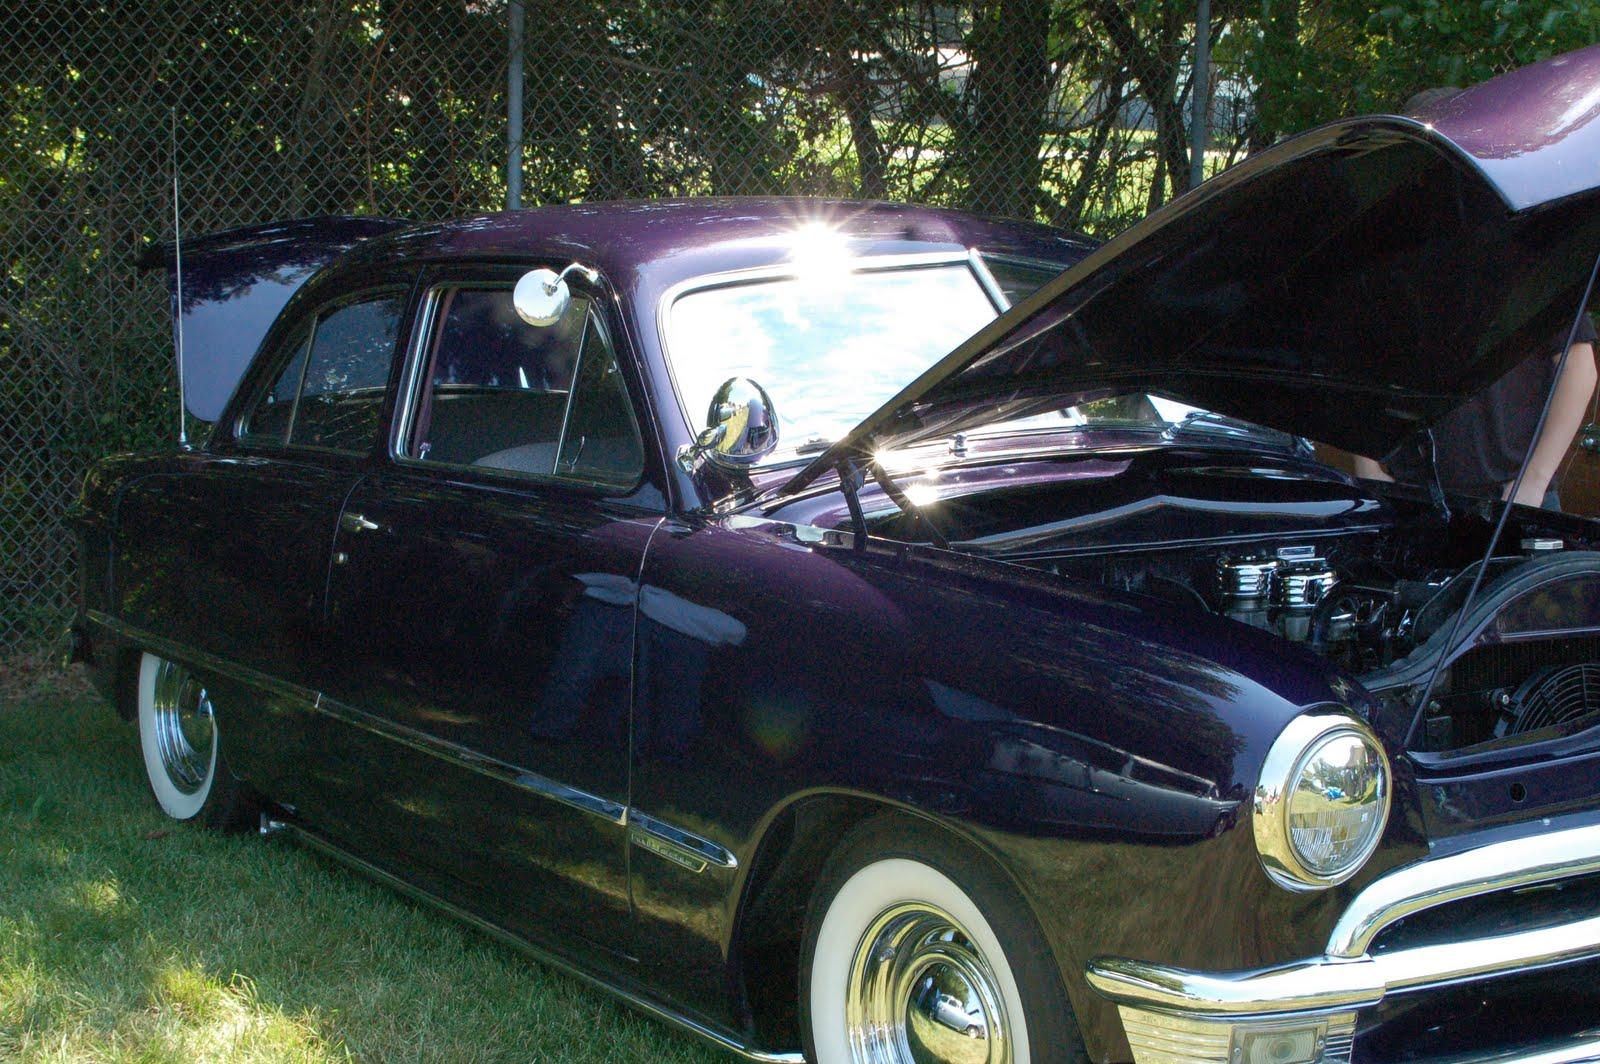 Turnerbudds Car Blog: The Color Purple